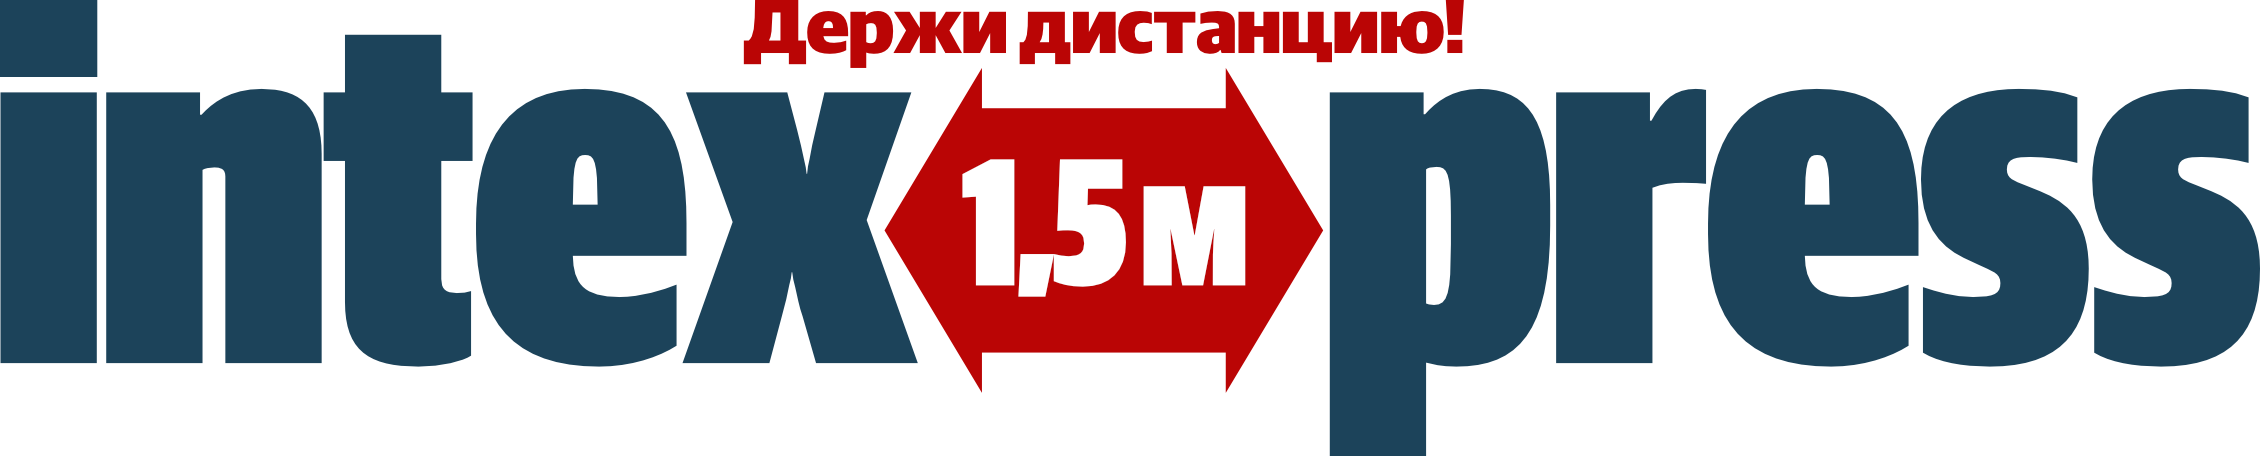 Intex-press. Последние новости города Барановичи, Беларуси и Мира